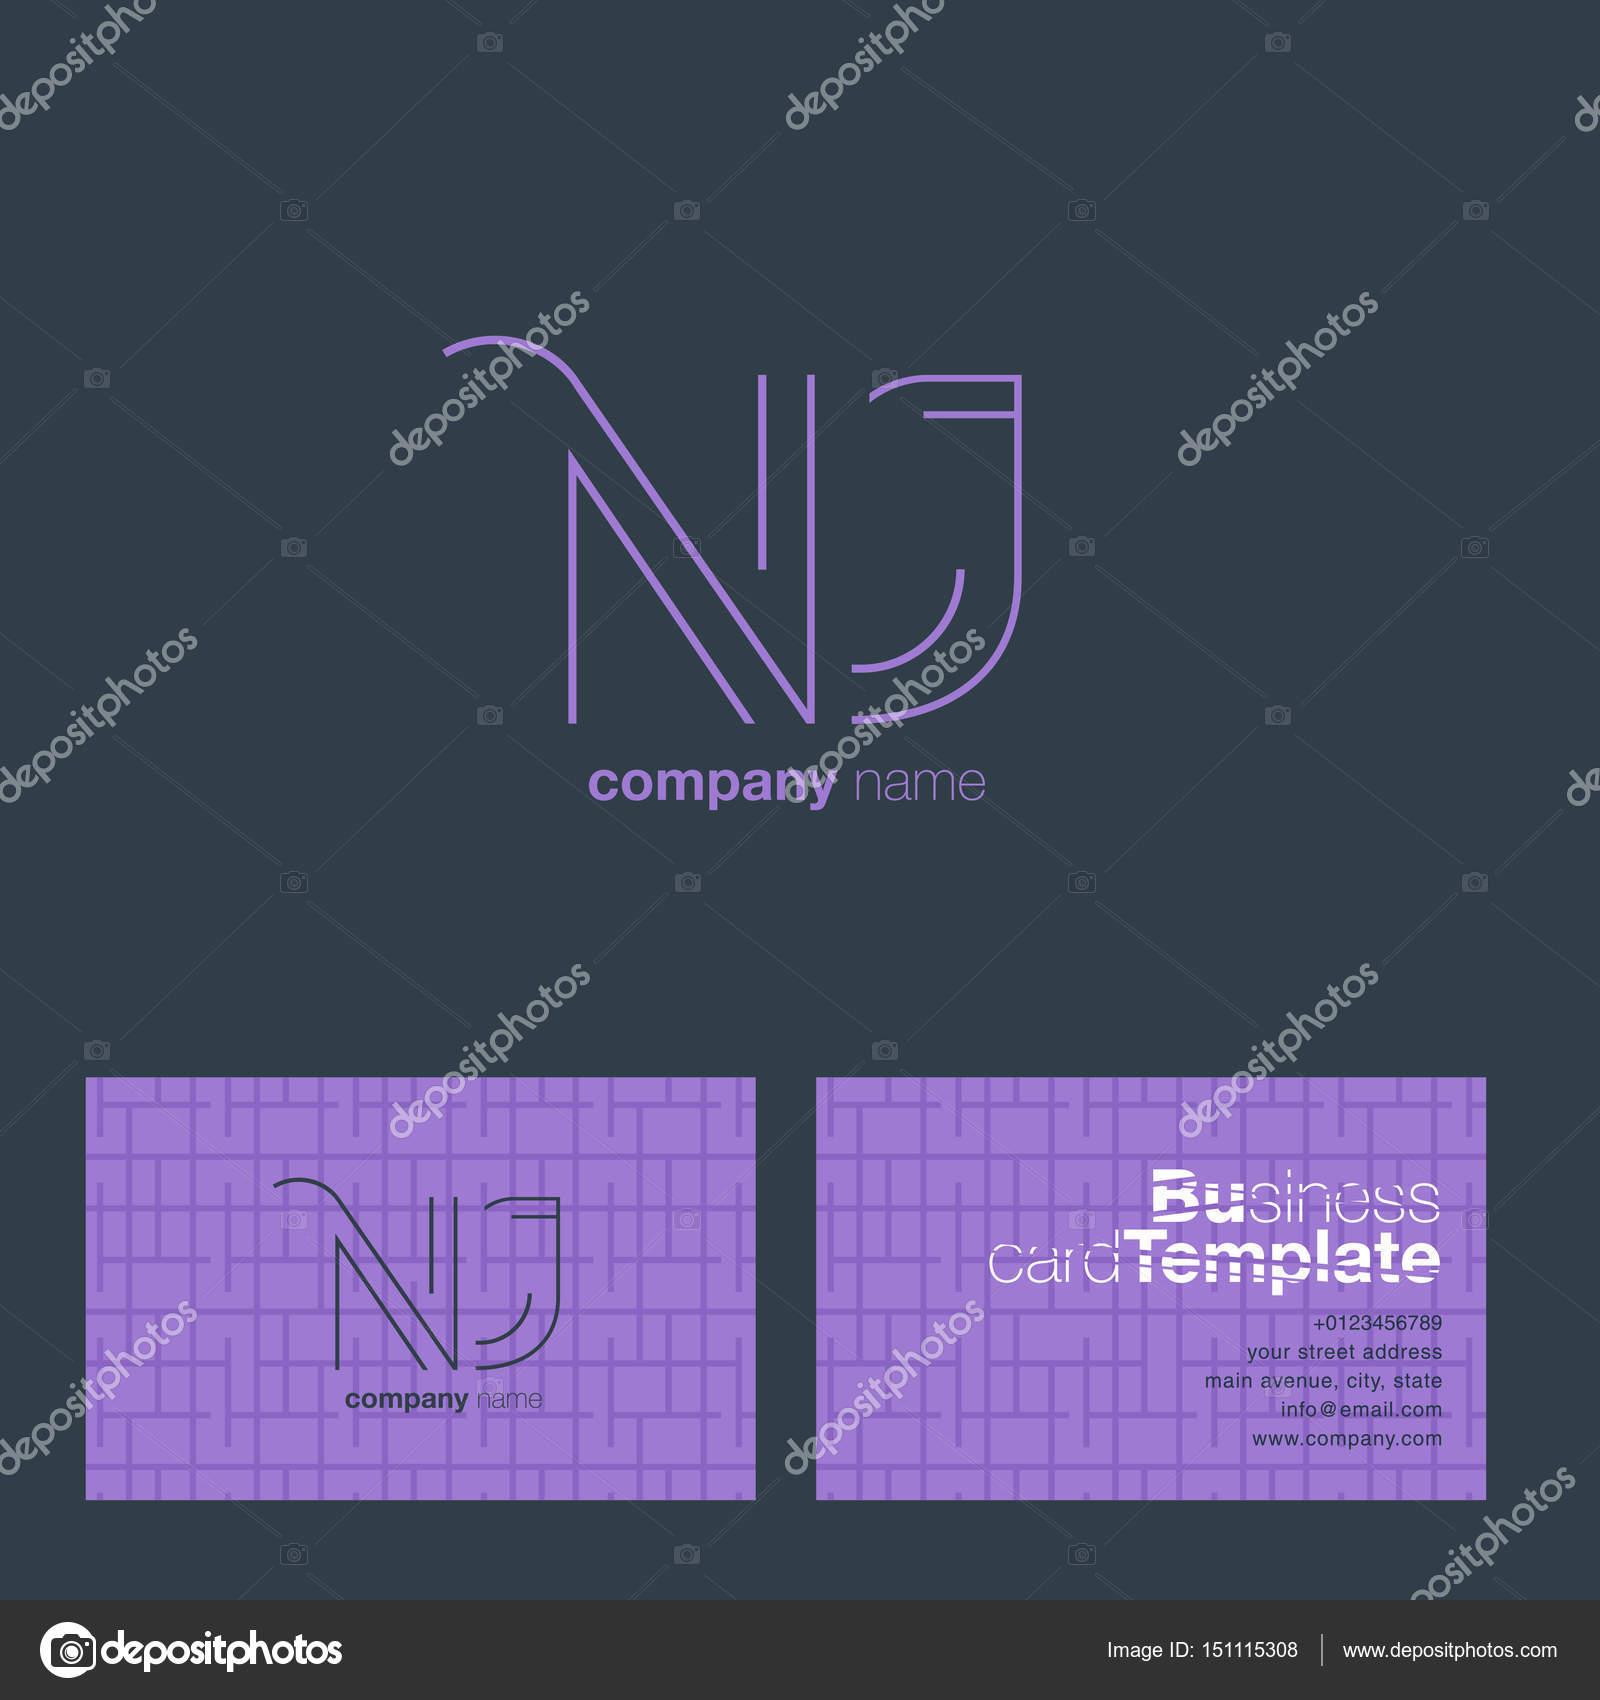 NJ Letters Logo Business Card — Stock Vector © brainbistro #151115308